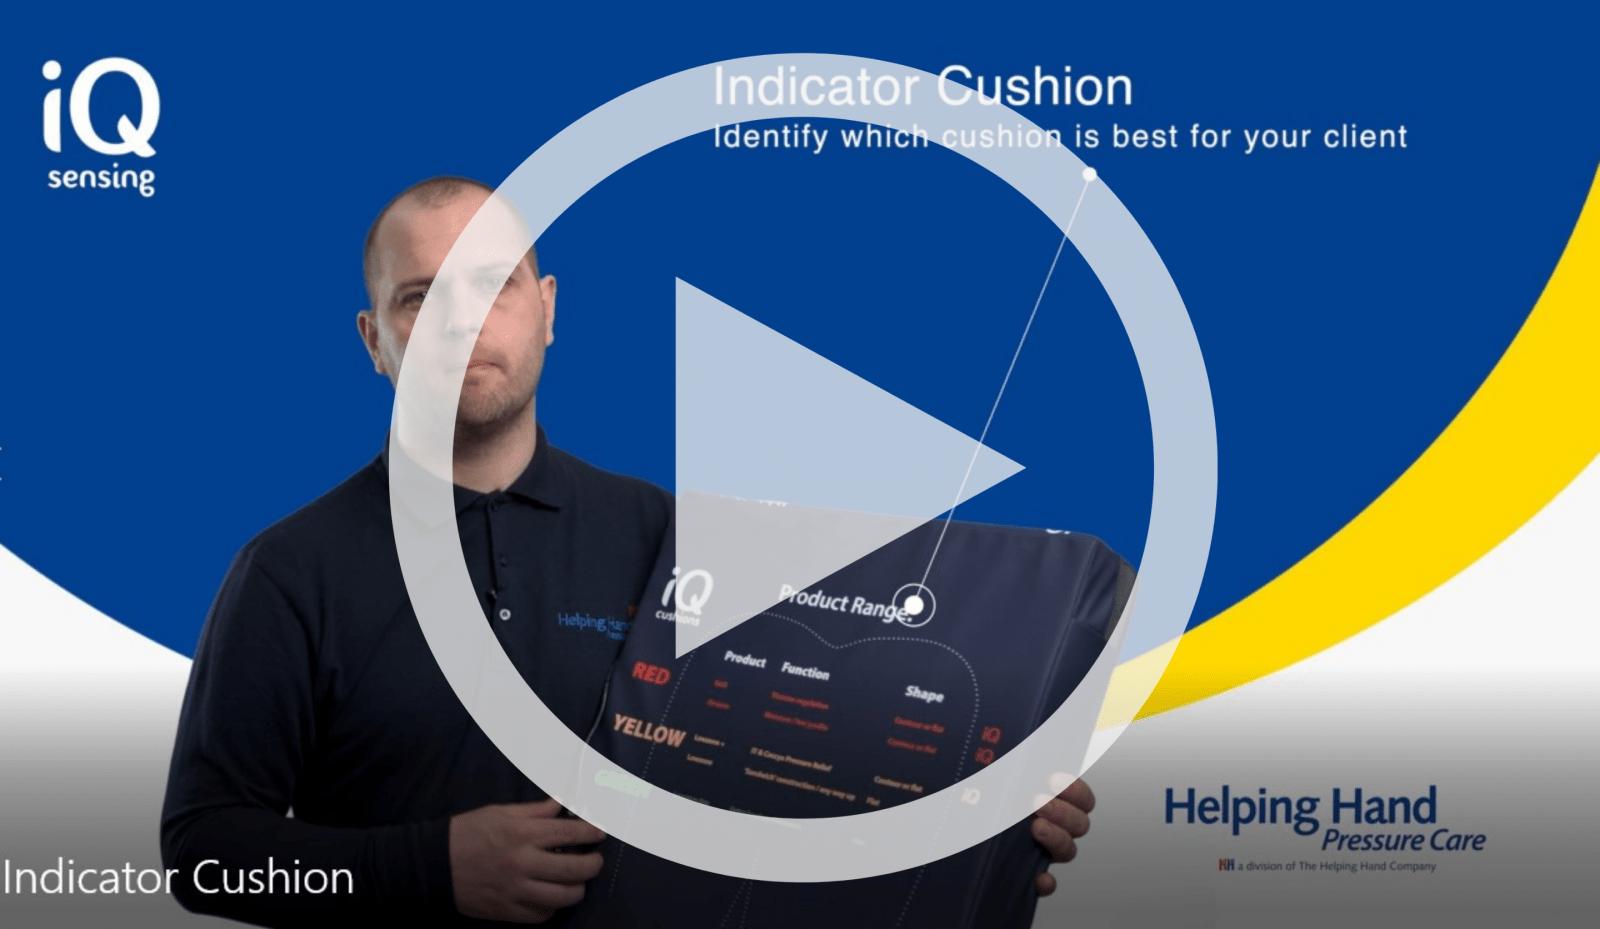 Indicator Video Helping Hand Pressure Care assessment tool.  Help reduce pressure sore or pressure injuries